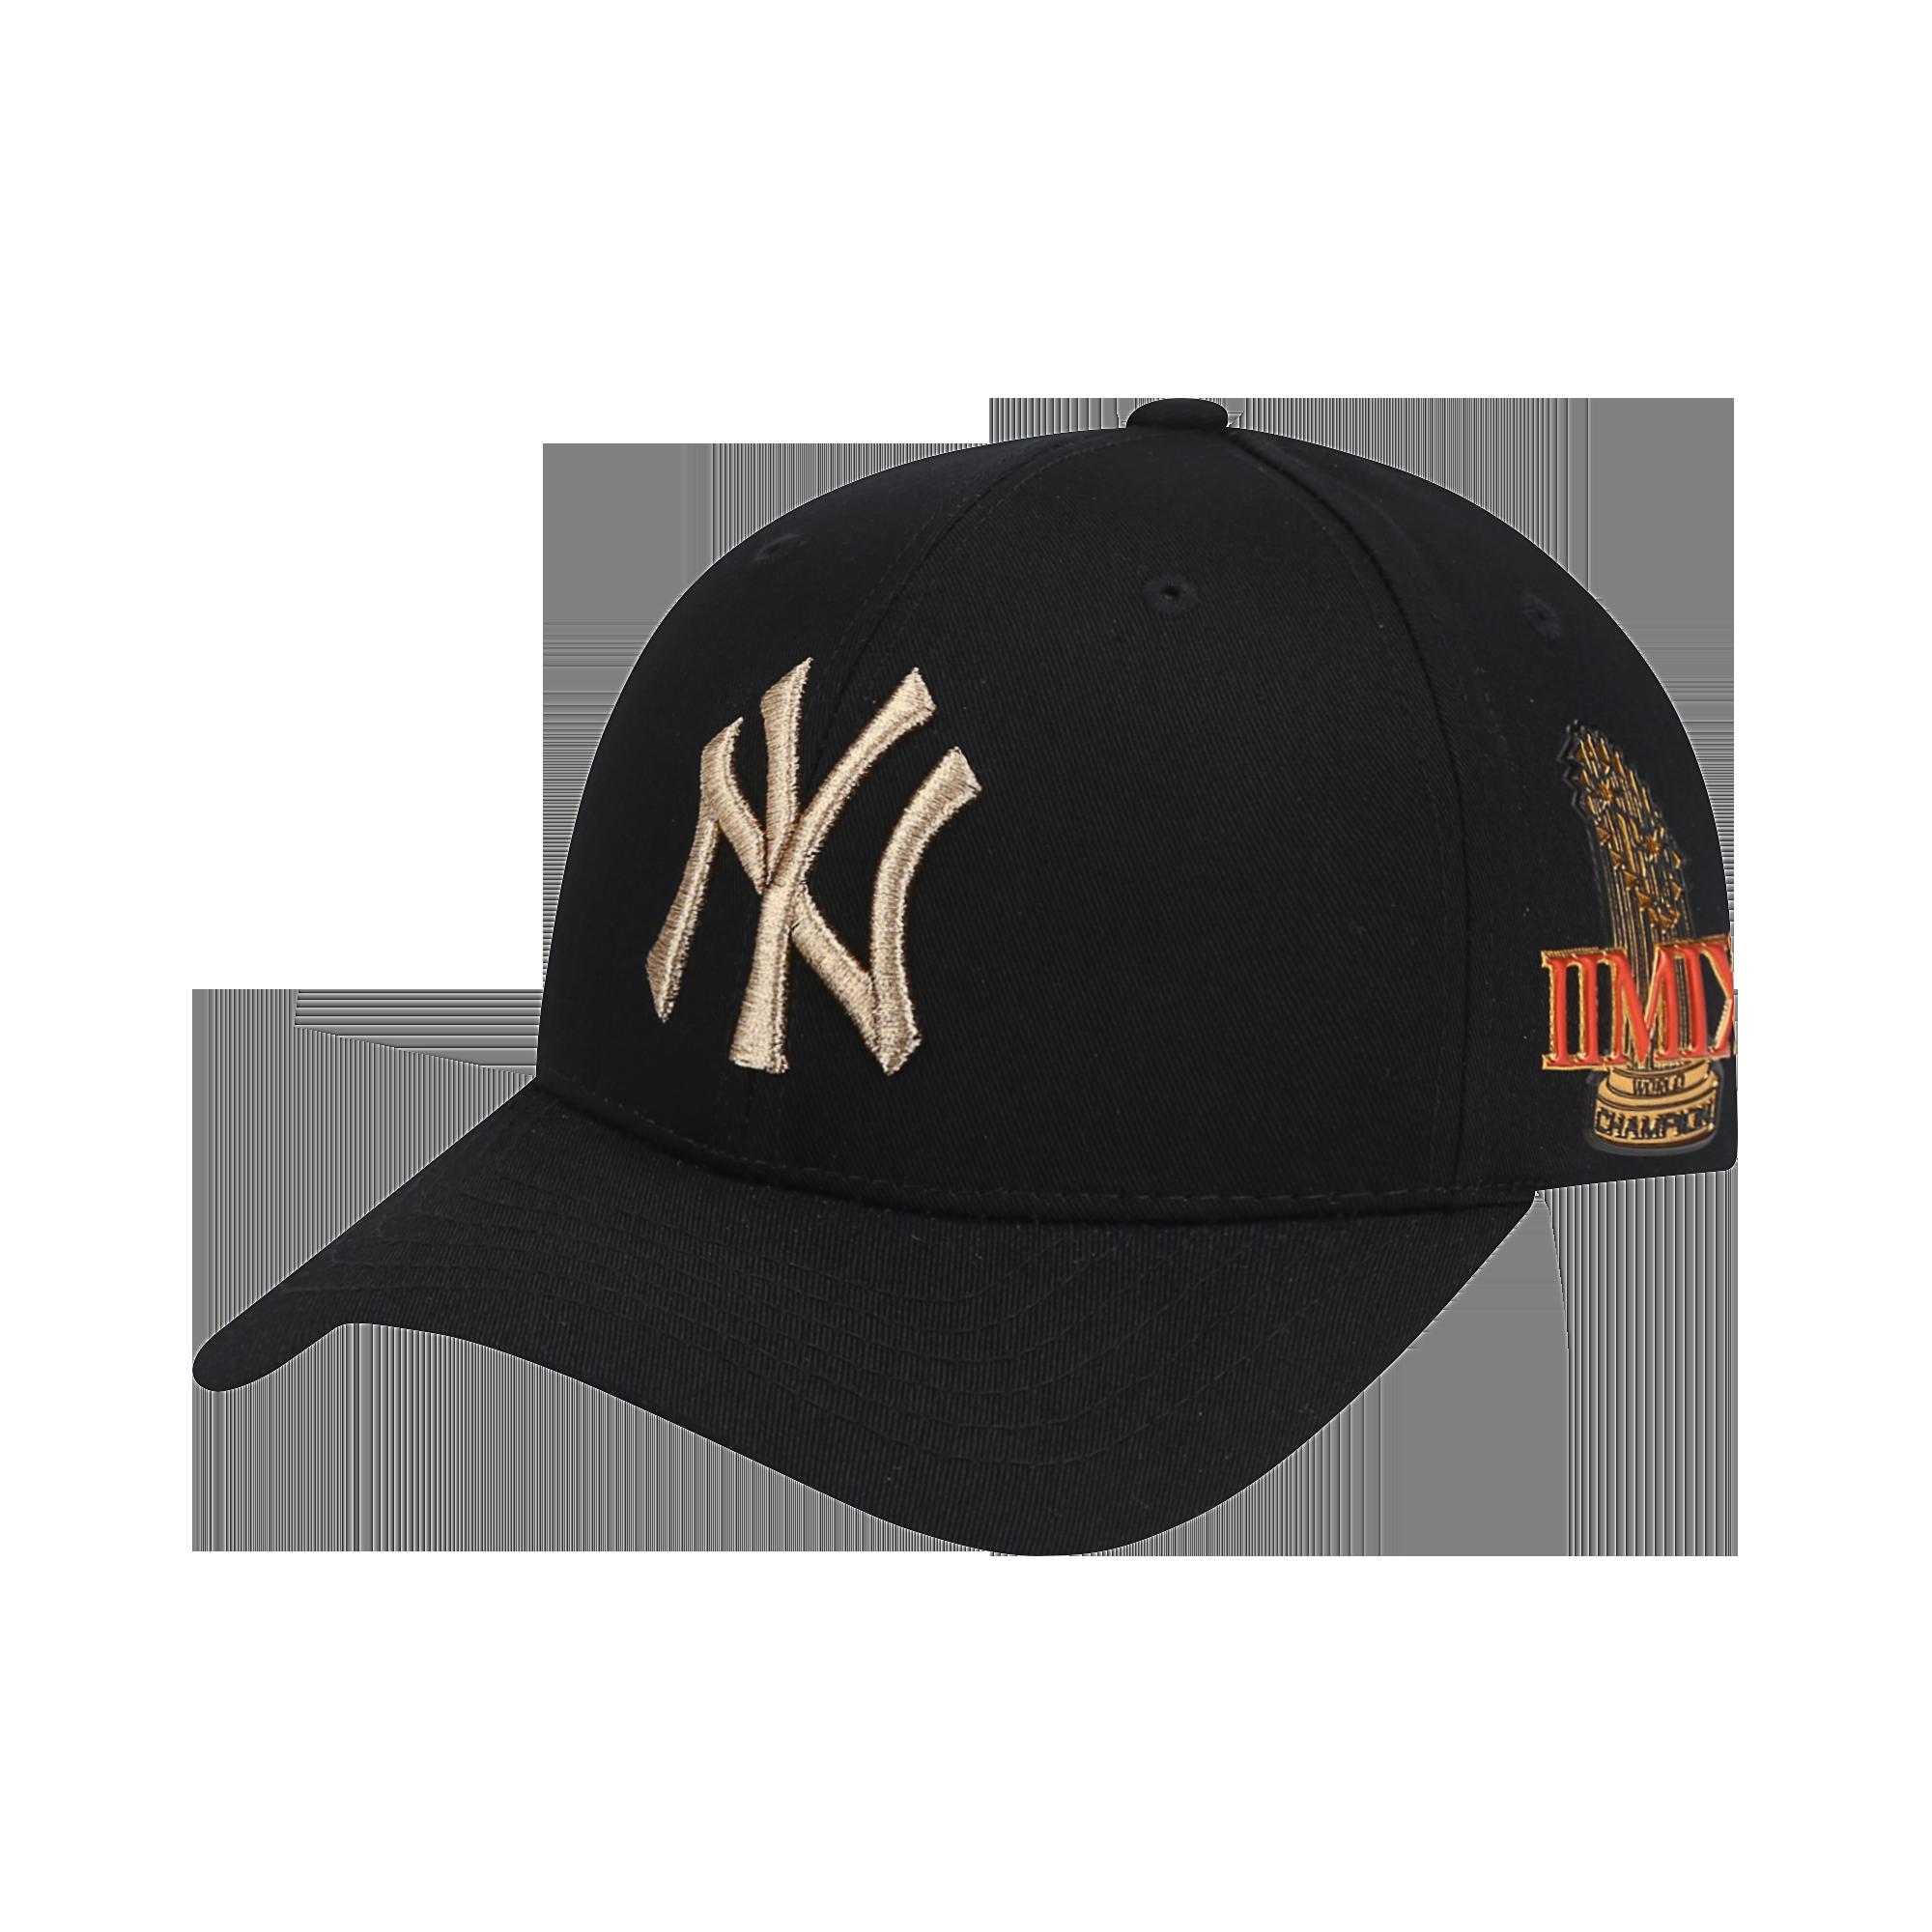 NEW YORK YANKEES CHAMPION ADJUSTABLE CAP